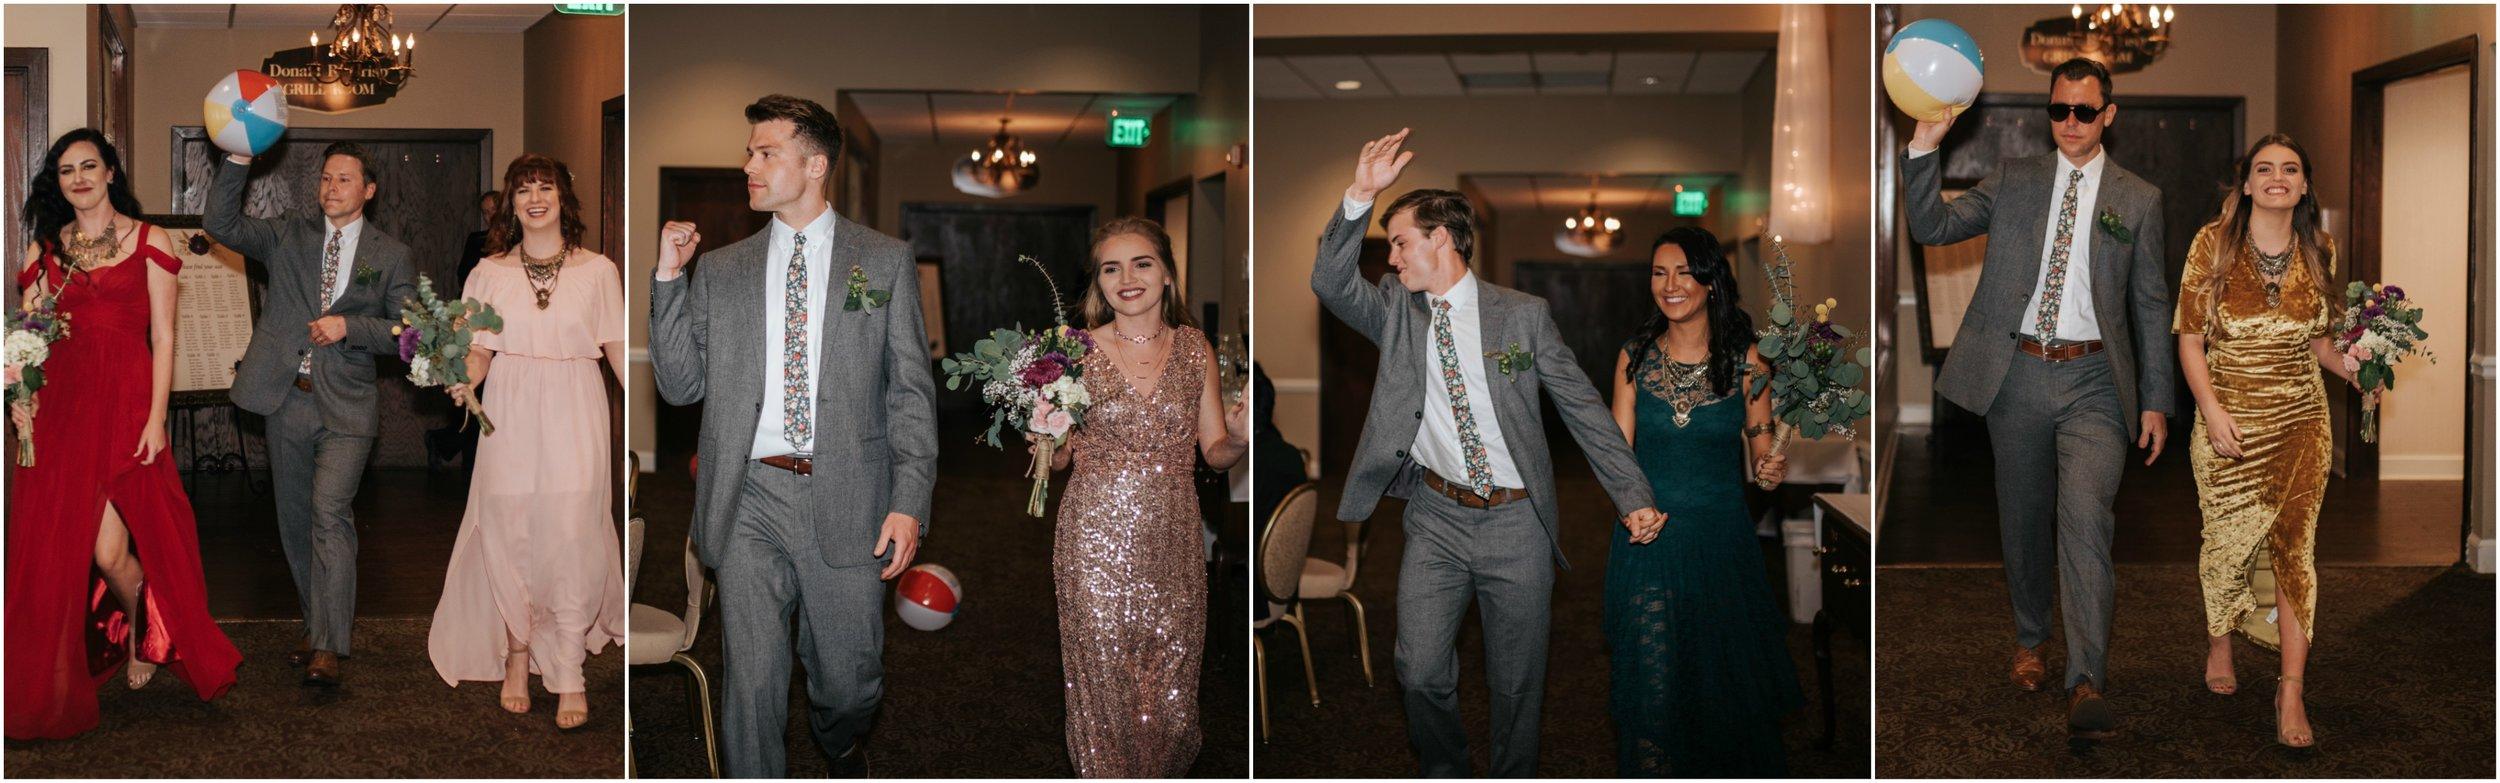 zayda-collin-wedding-intros.jpg